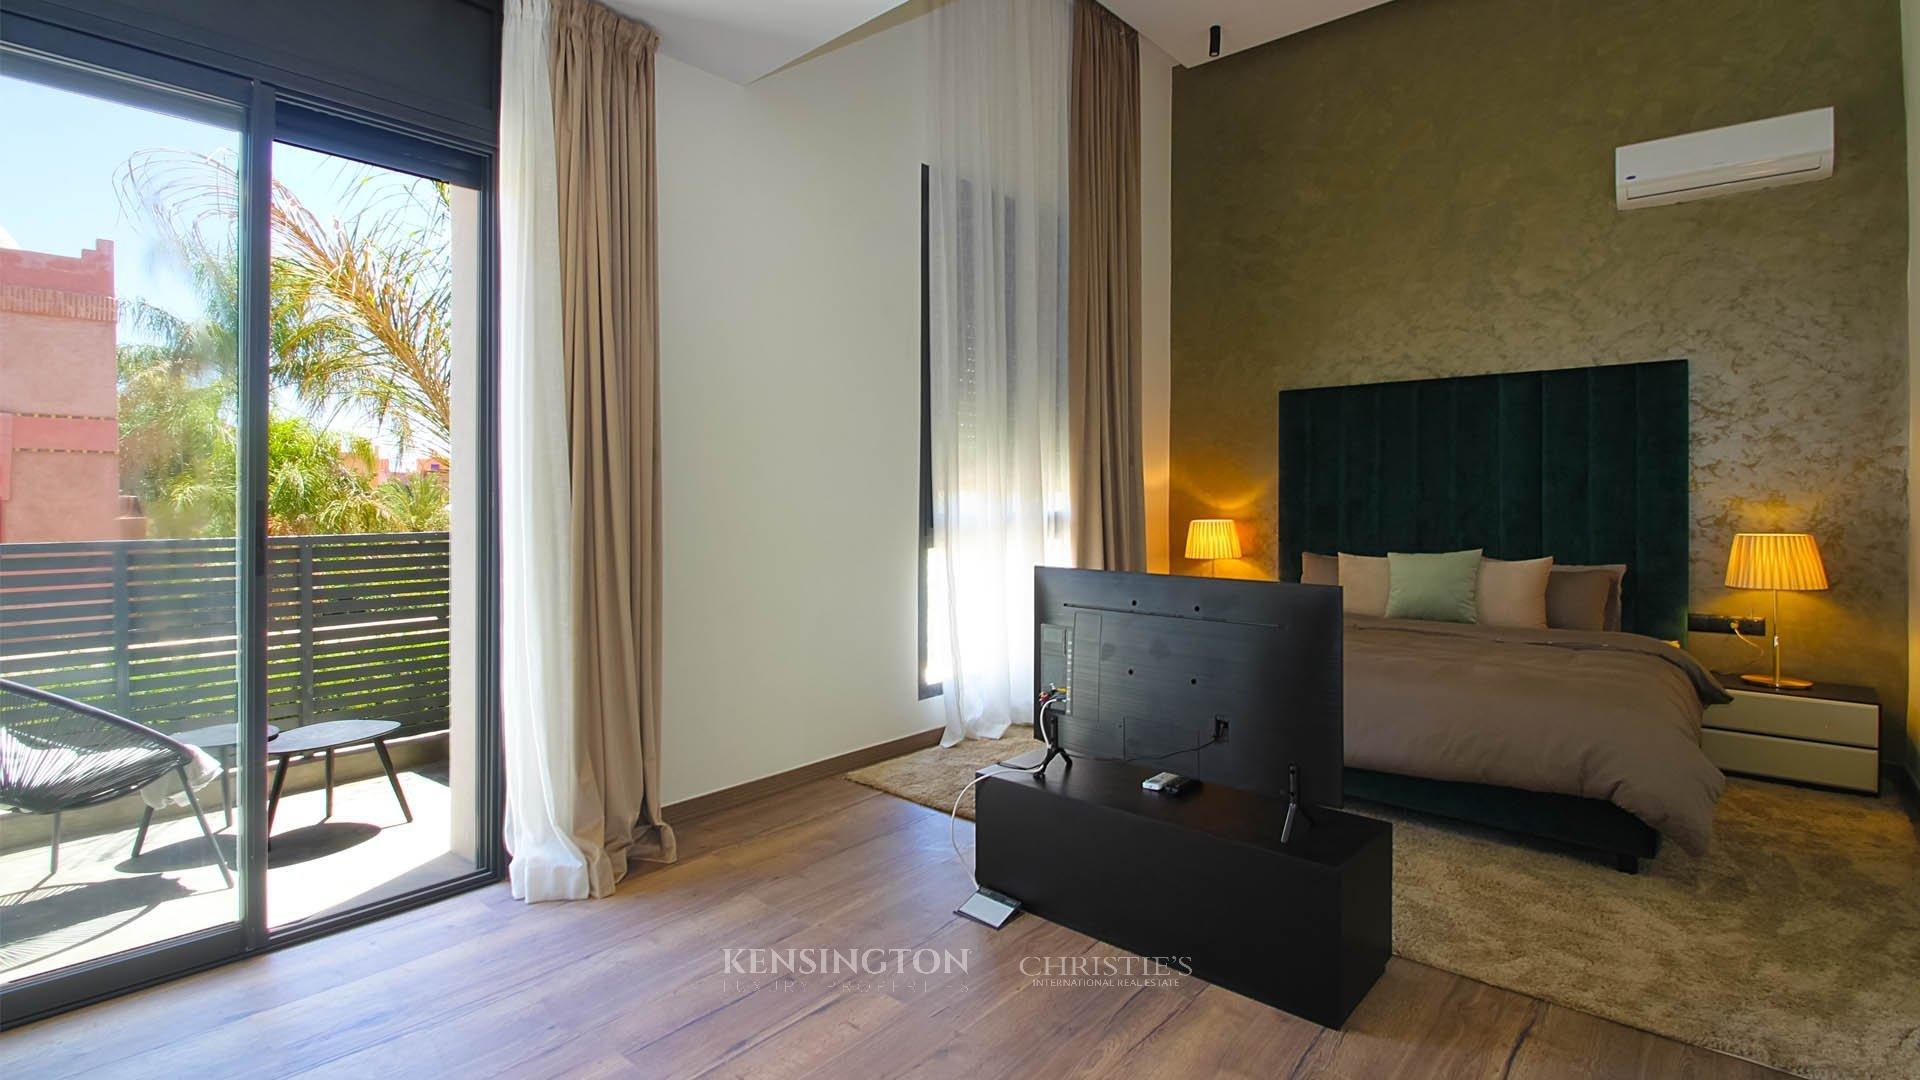 KPPM01235: Villa Sara Luxury Villa Marrakech Morocco